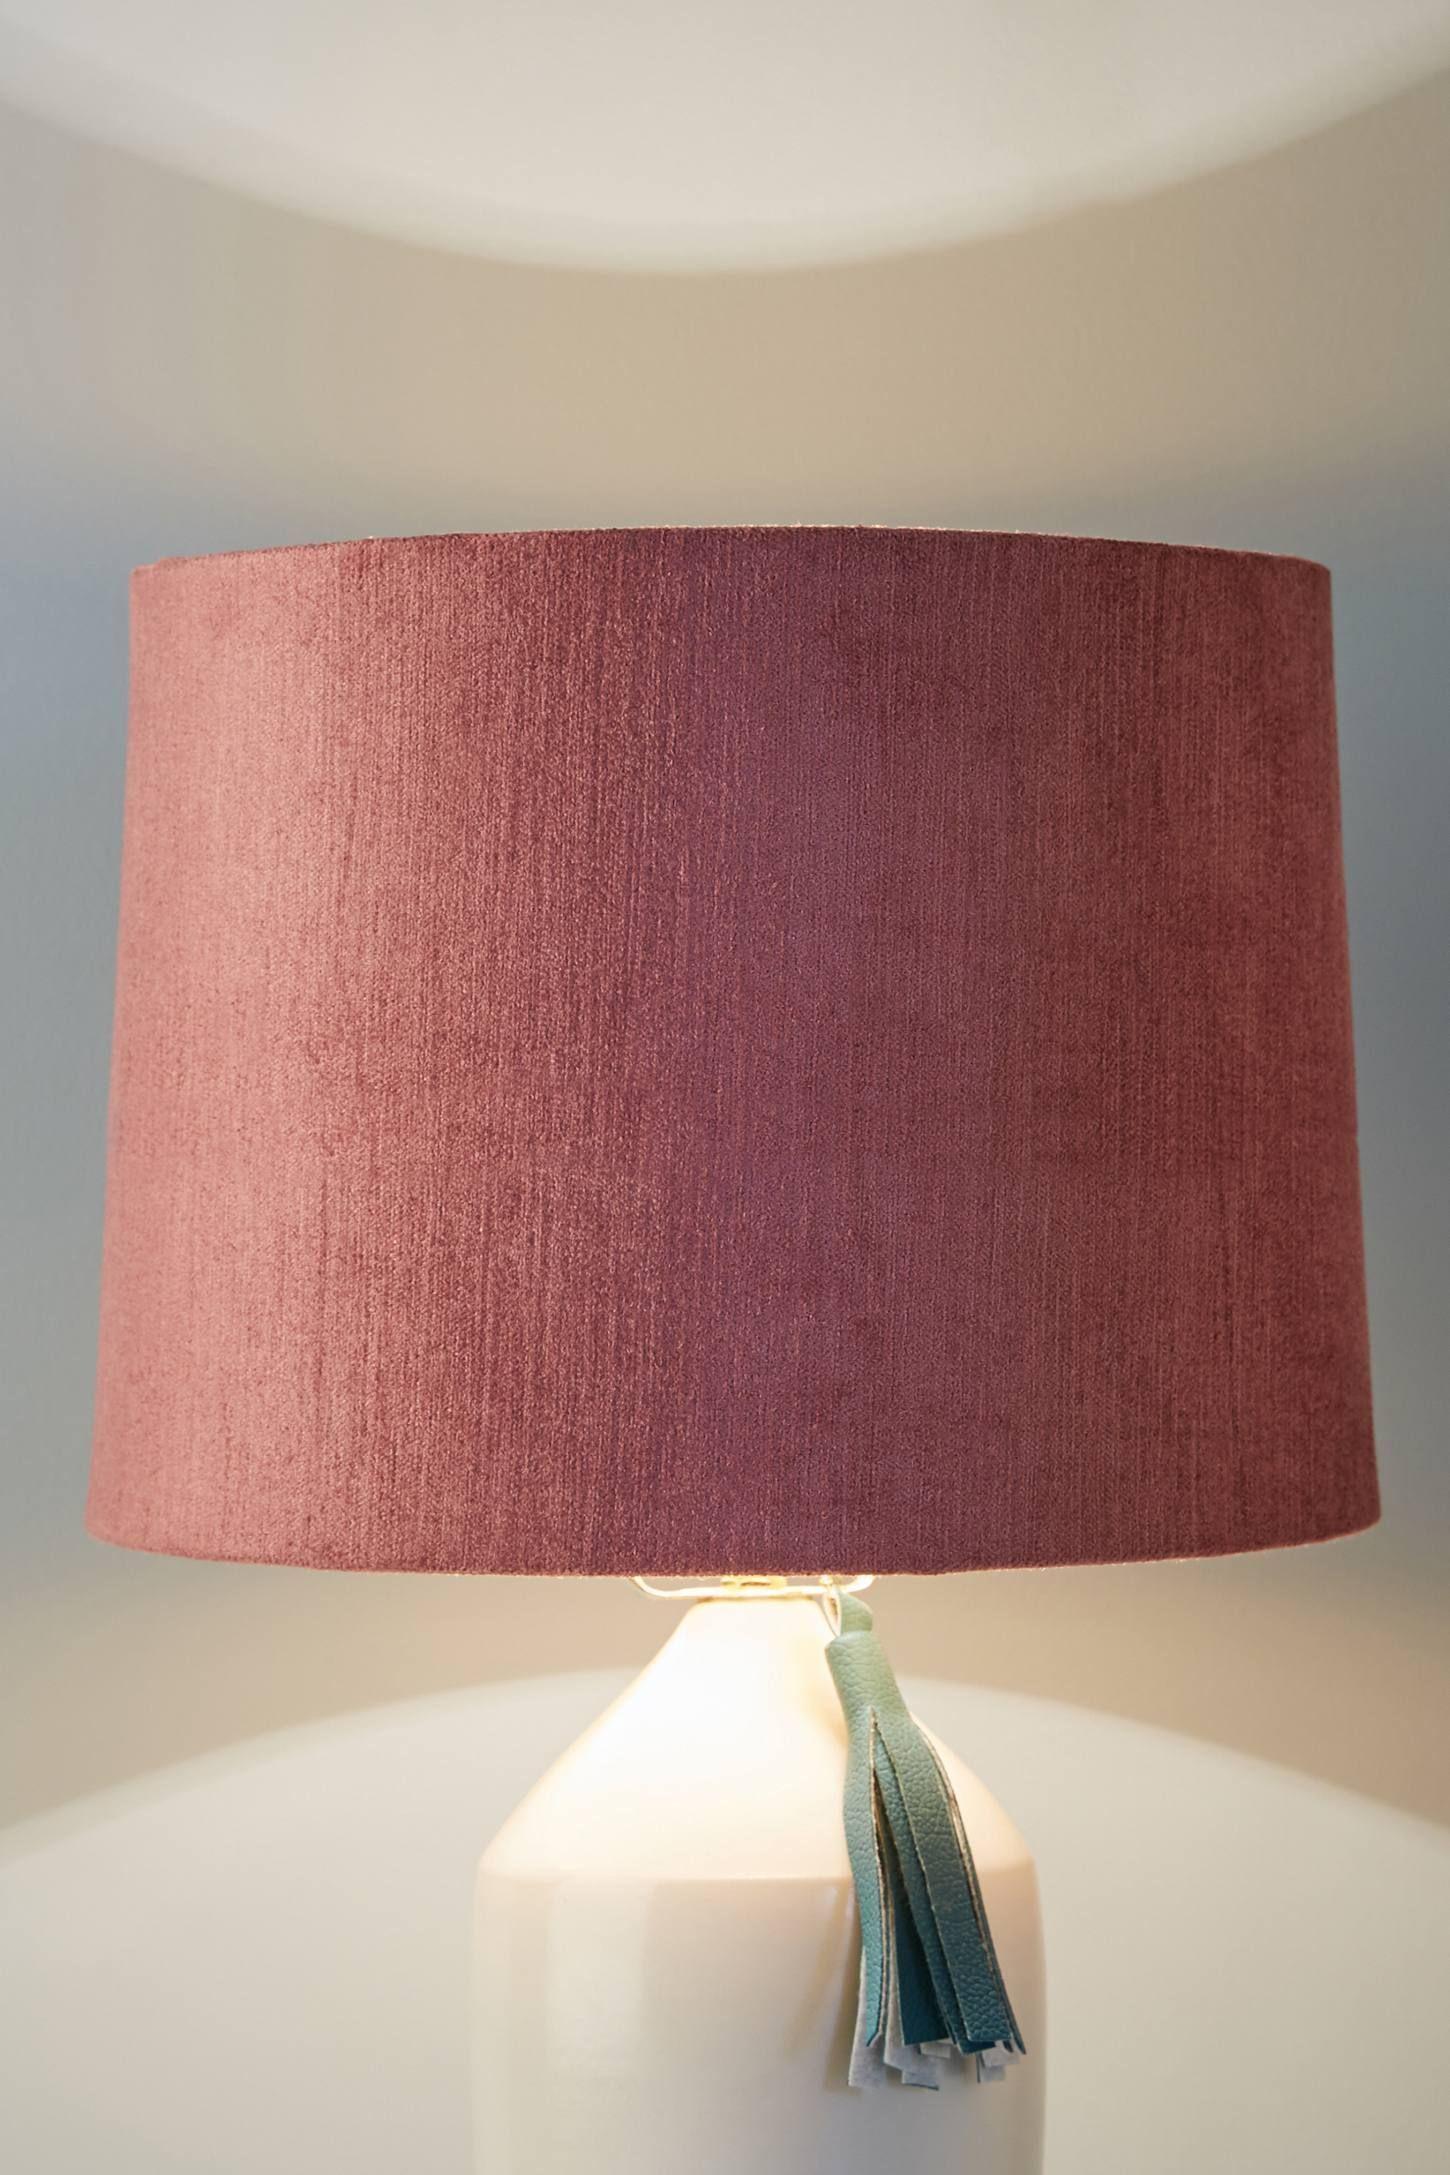 Solid Velvet Lamp Shade Lamp Shade Contemporary Lamp Shades Lamp